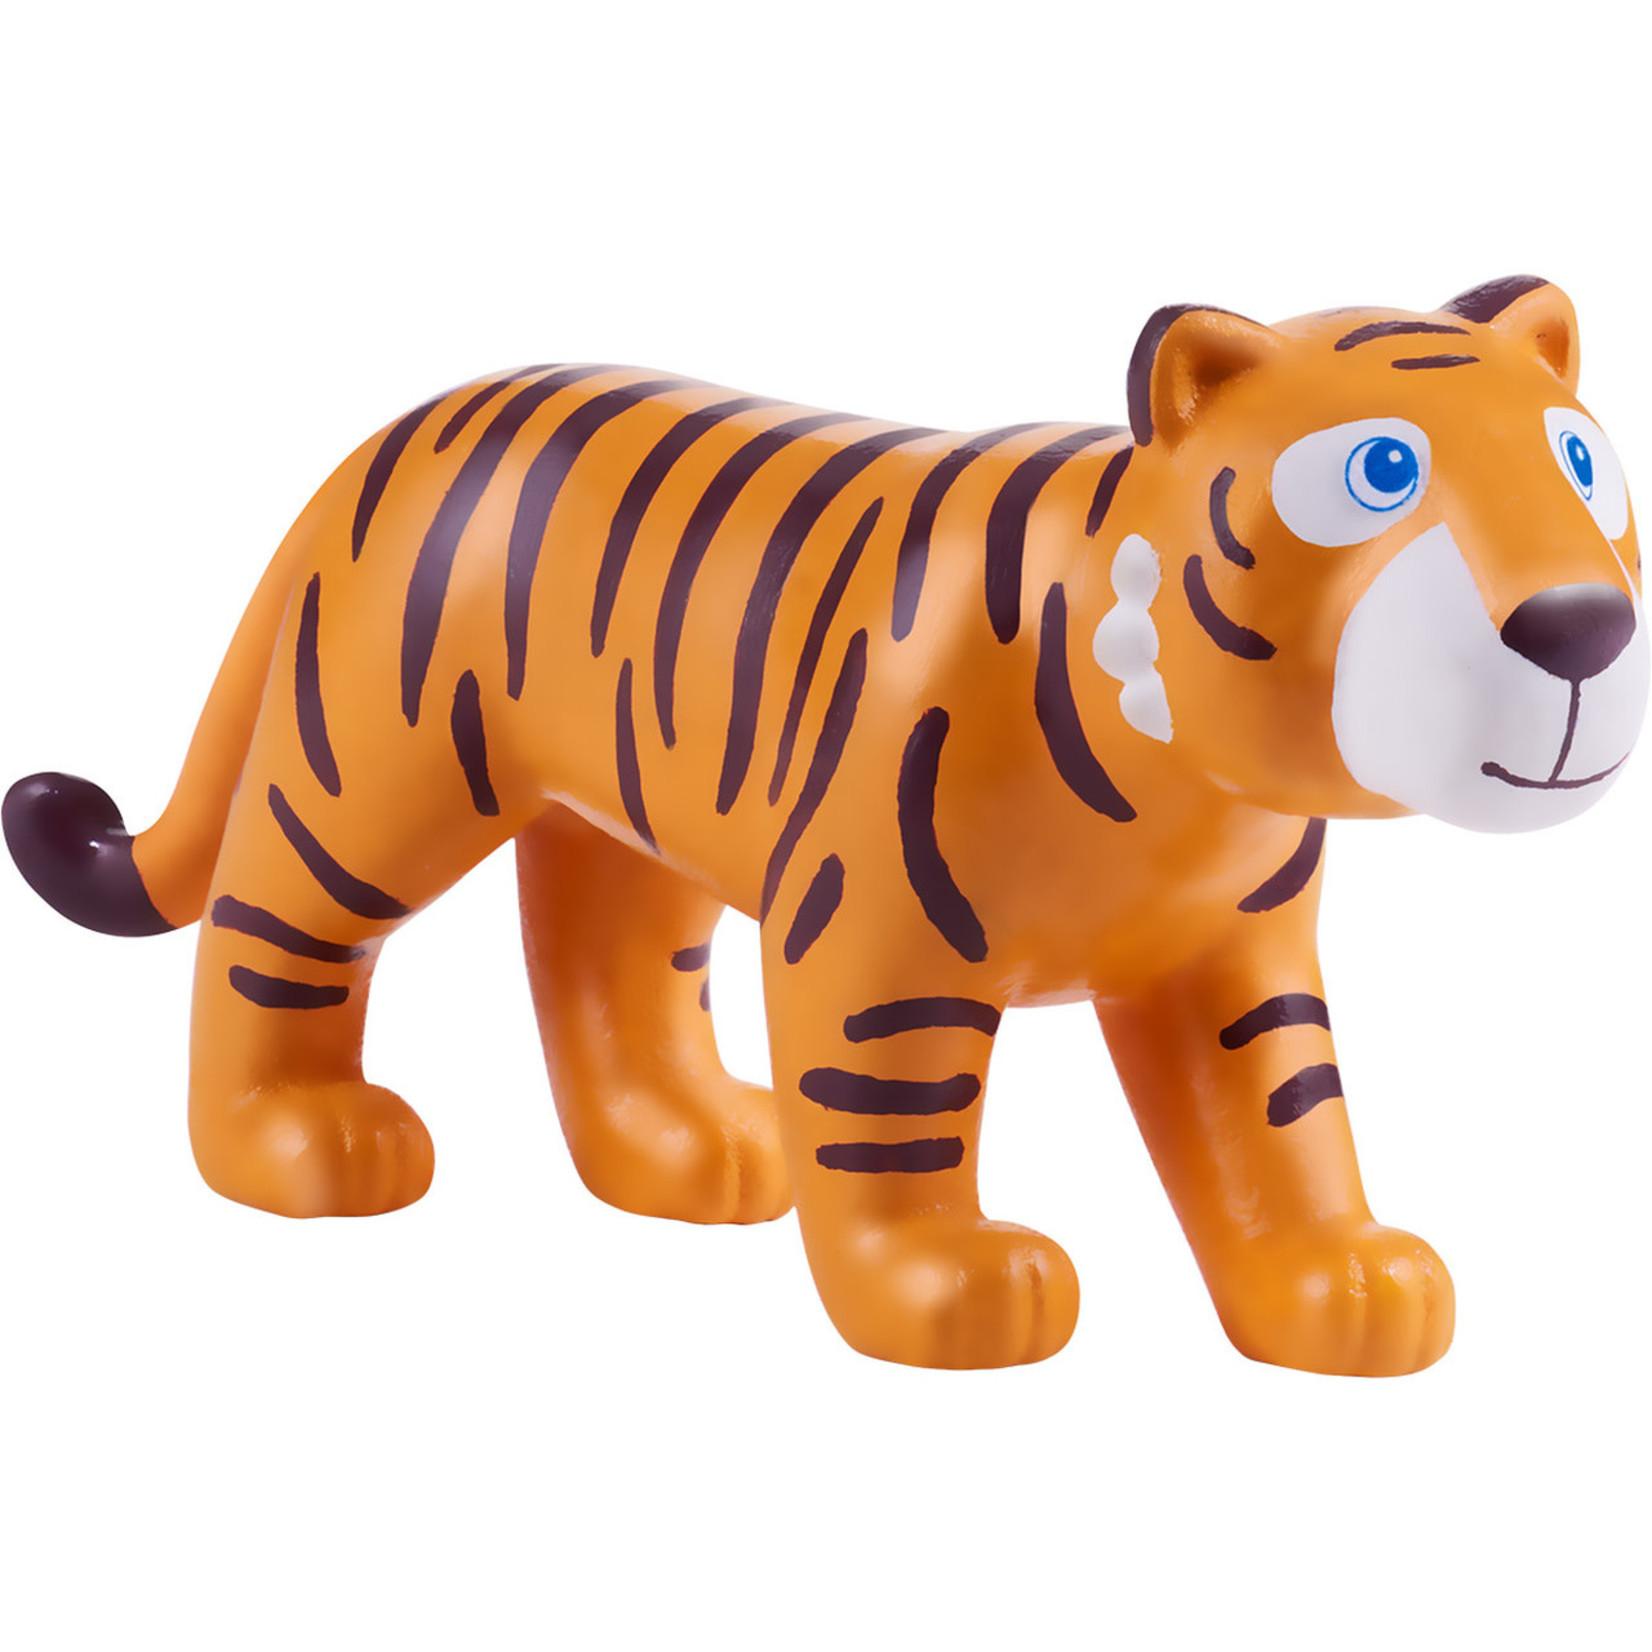 Haba Little Friends - Tiger